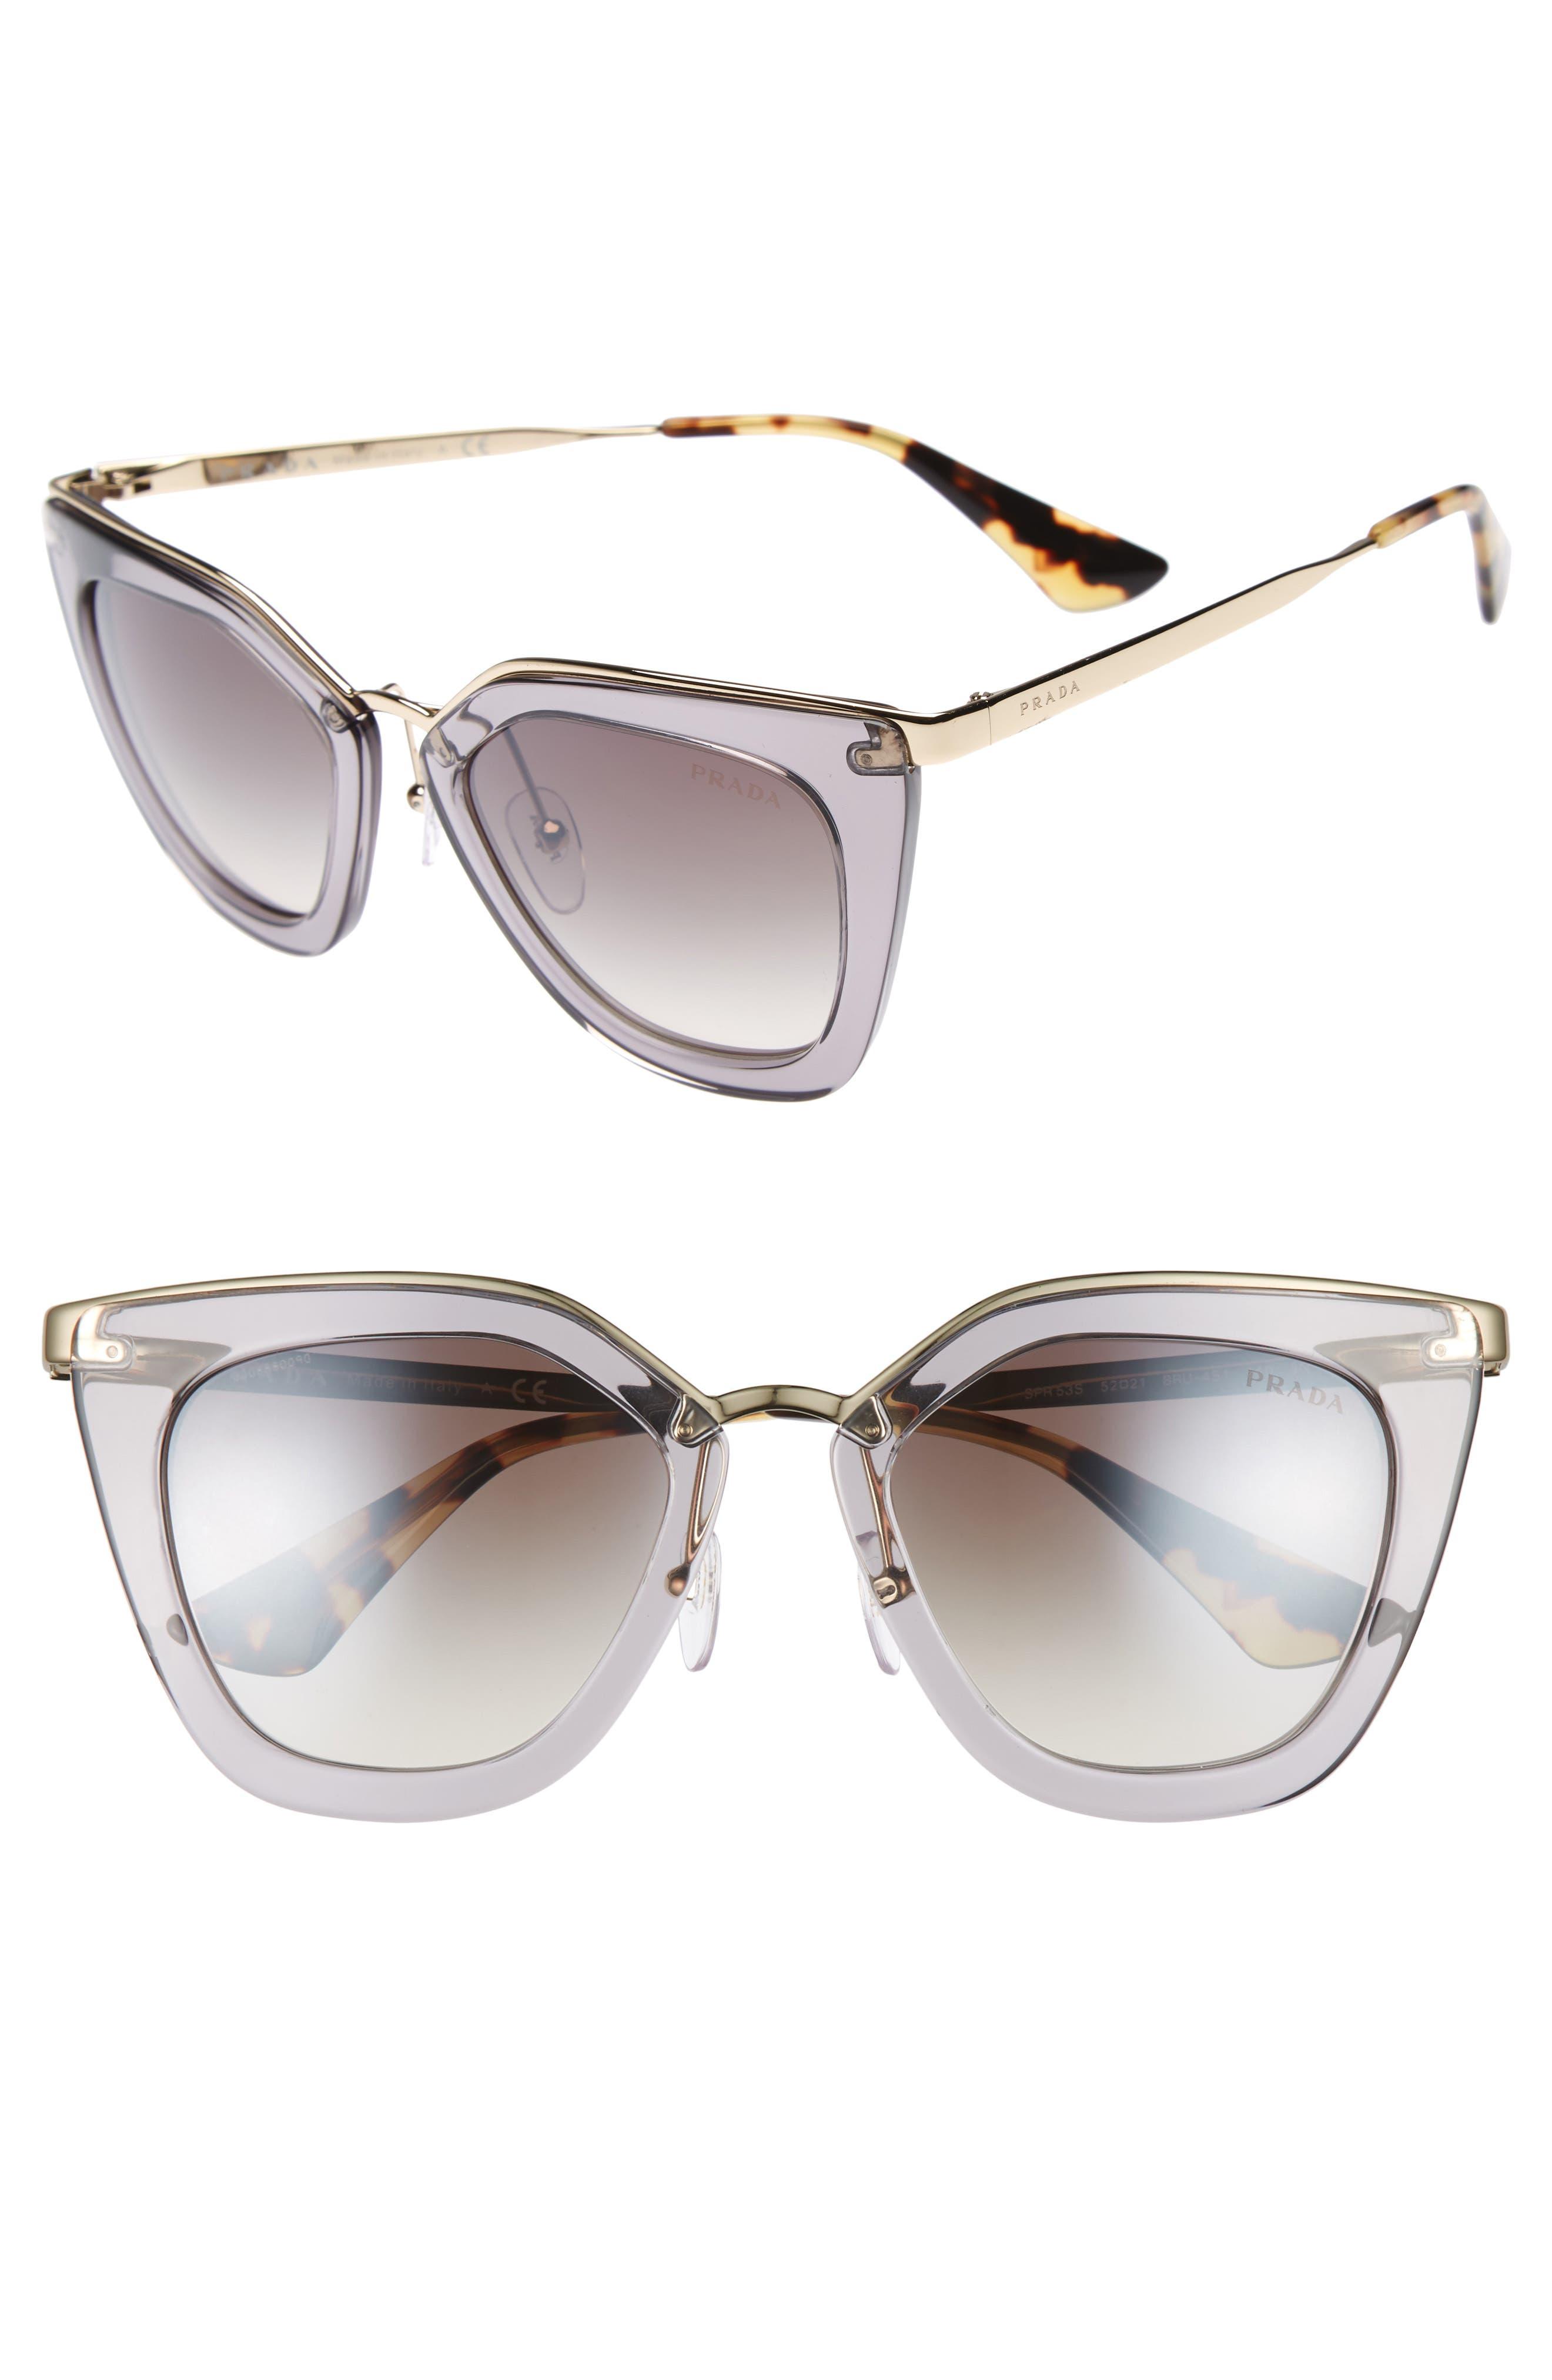 52mm Gradient Cat Eye Sunglasses,                         Main,                         color, 020